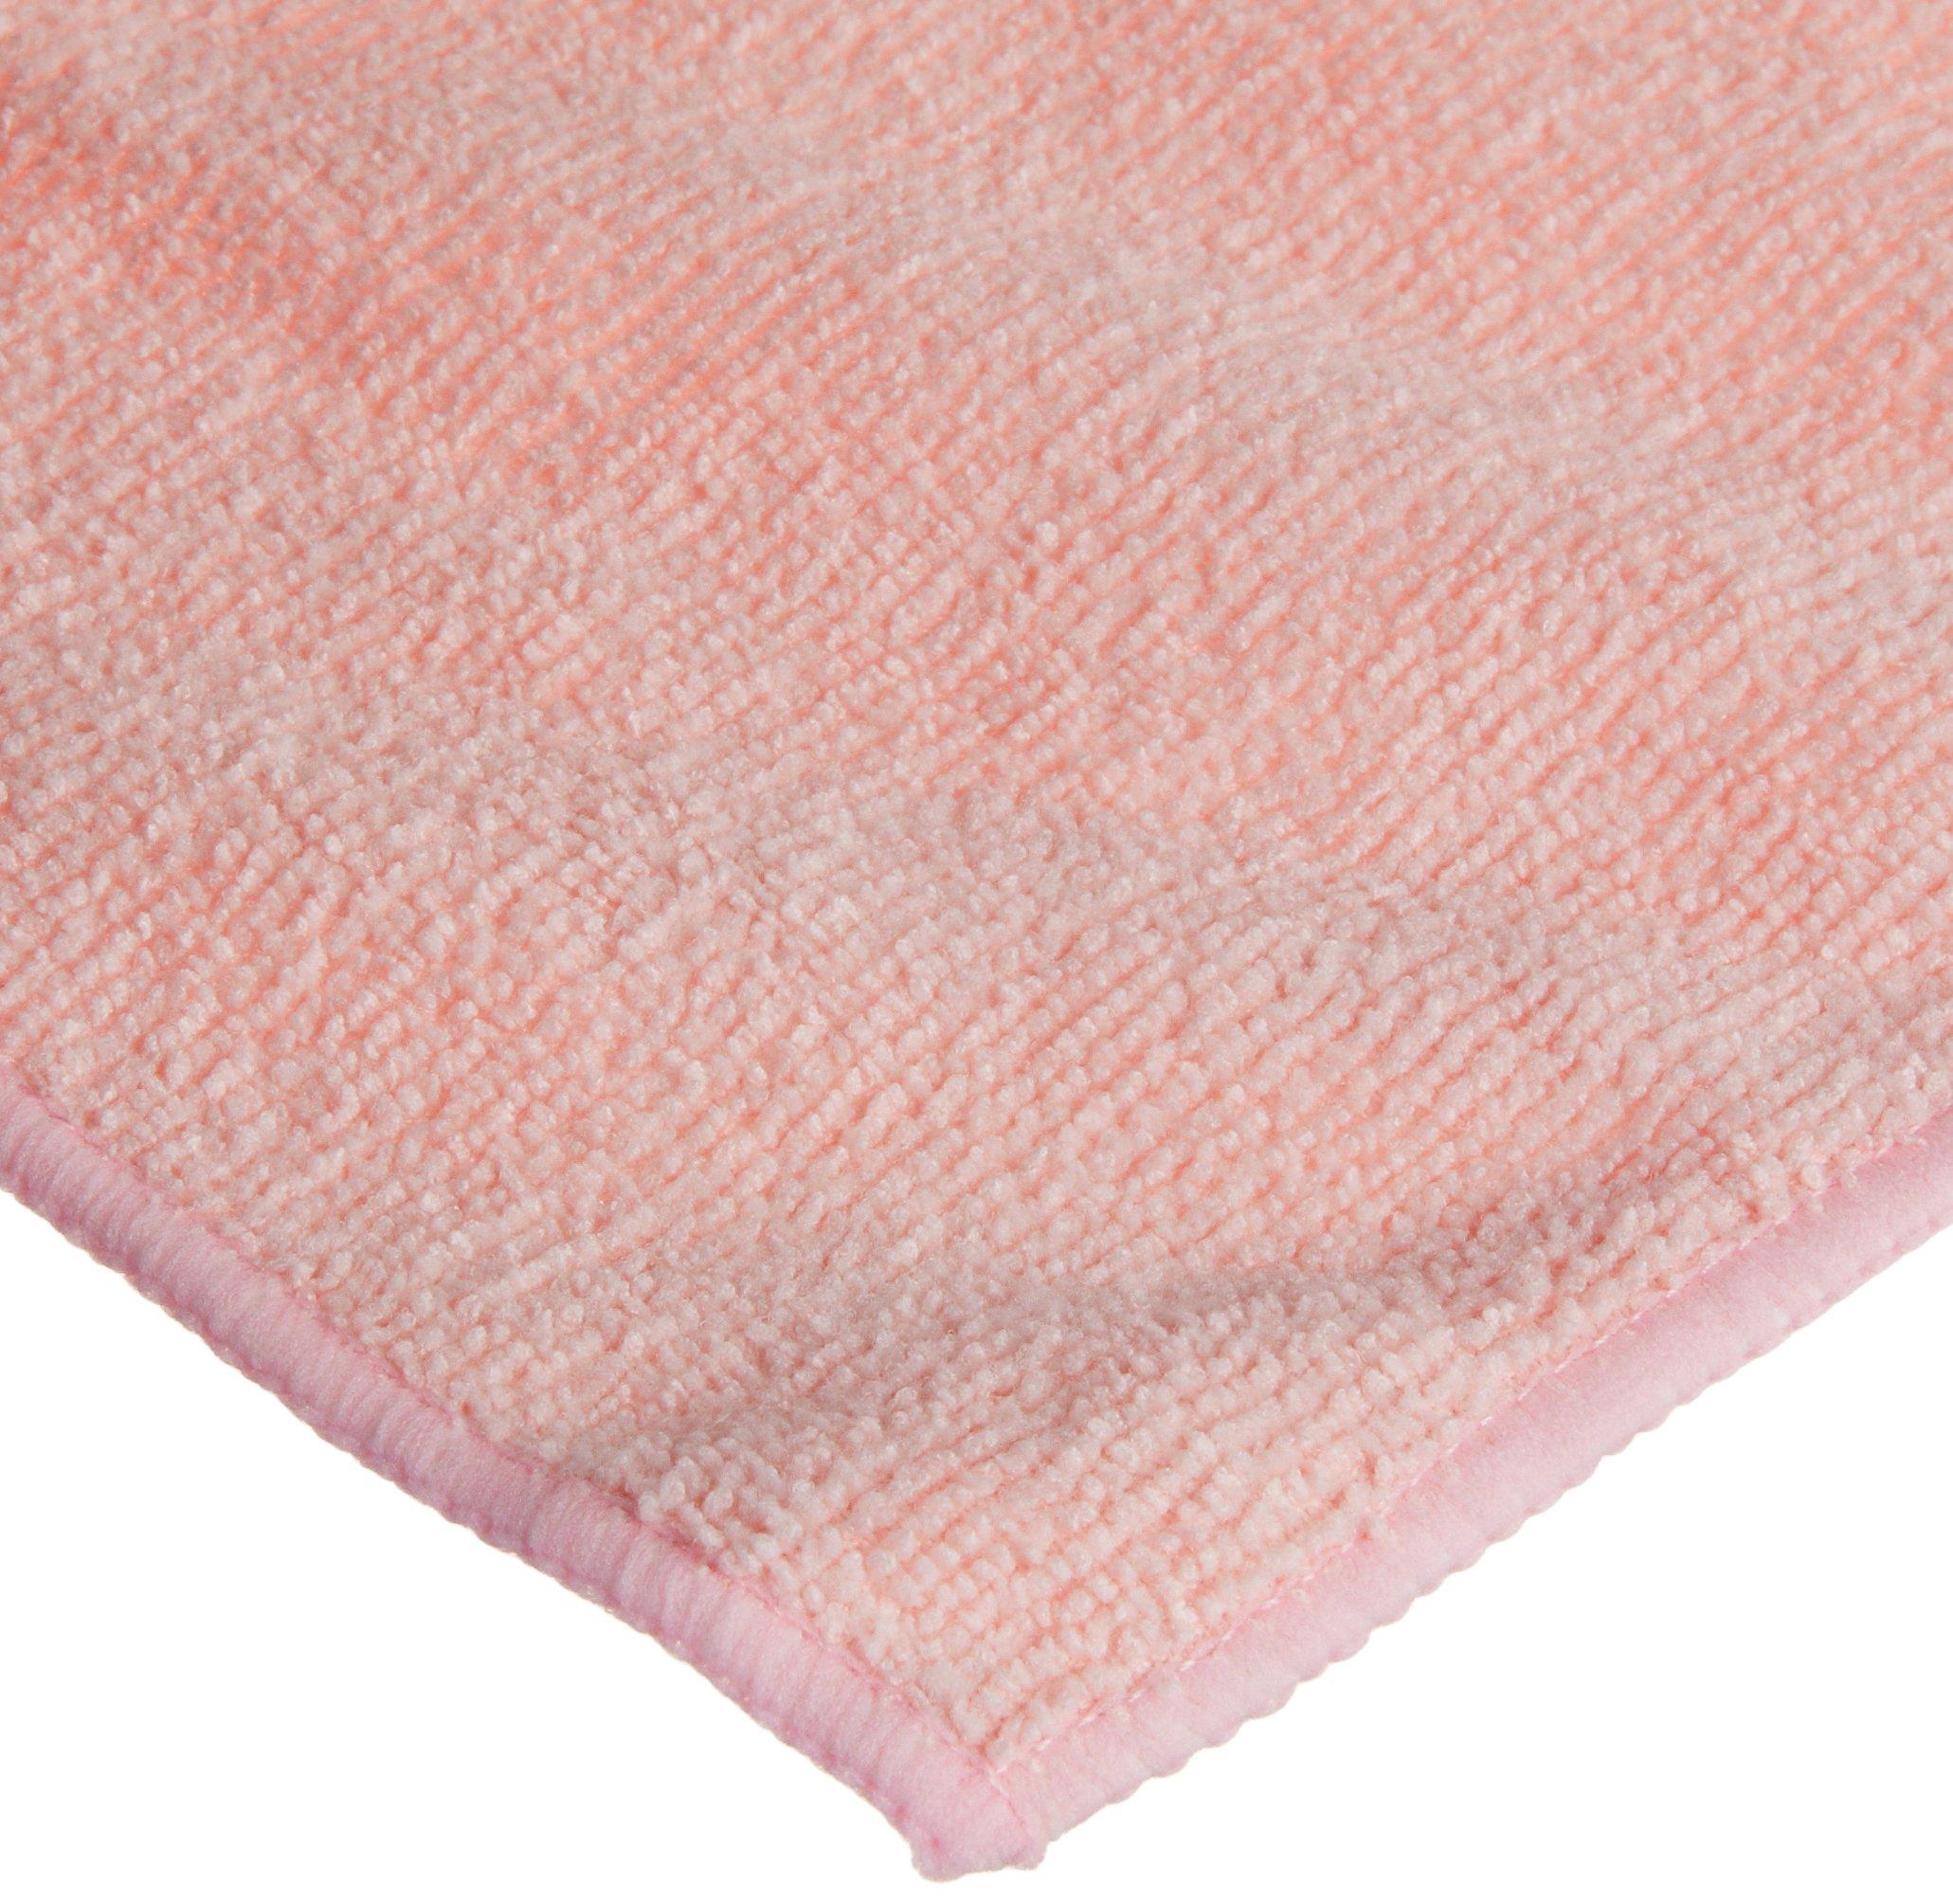 Wilen E841016, Supremo Microfiber Cloth, 16'' Length x 16'' Width, Pink, Bulk Pack (Case of 180)